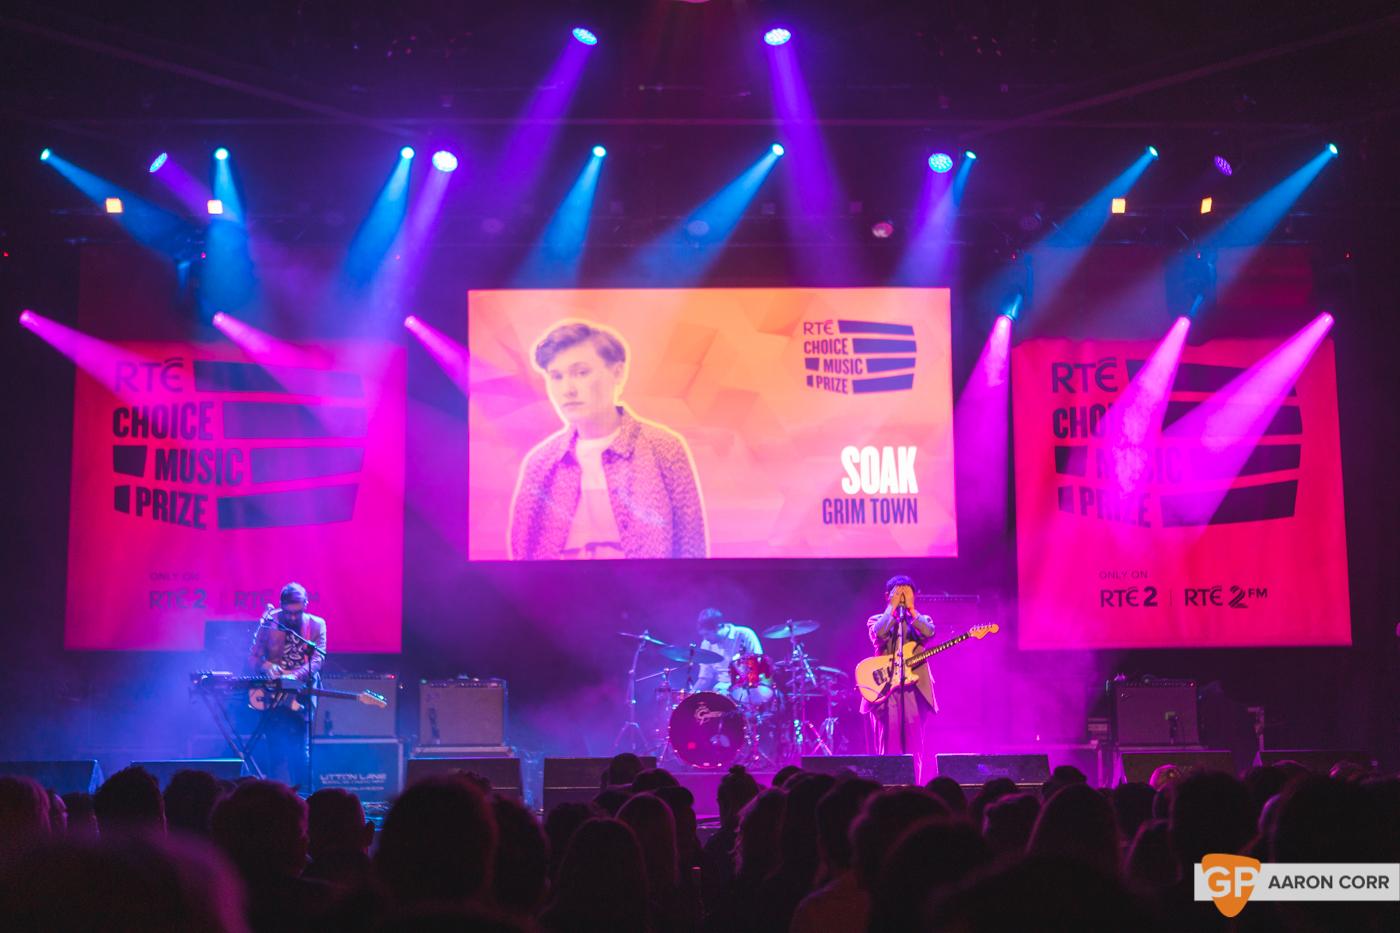 Soak at Choice Music Prize 2020 in Vicar Street, Dublin on 05-Mar-20 by Aaron Corr-2510